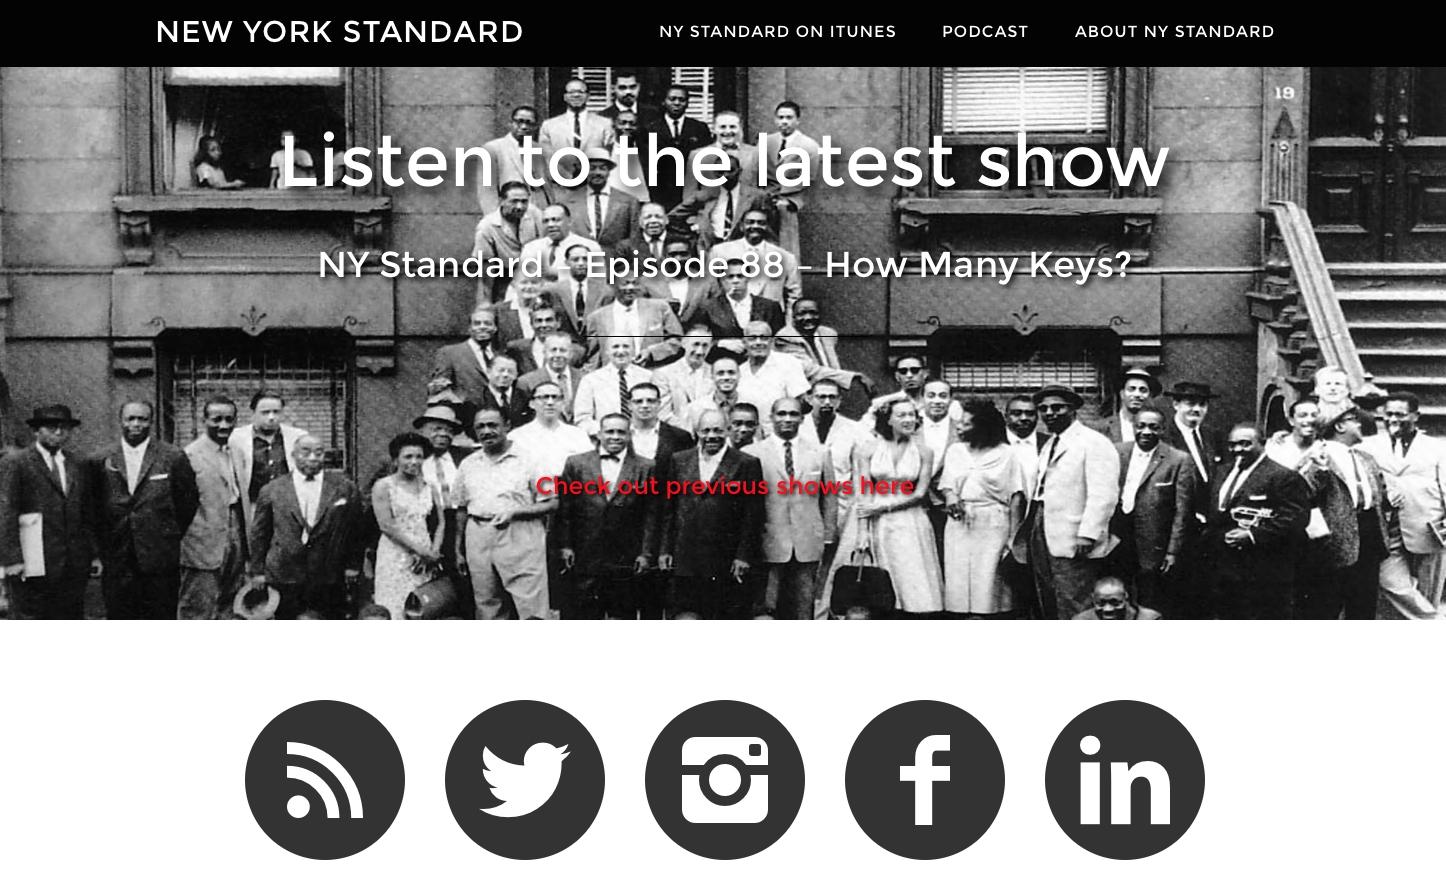 New York Standard podcast